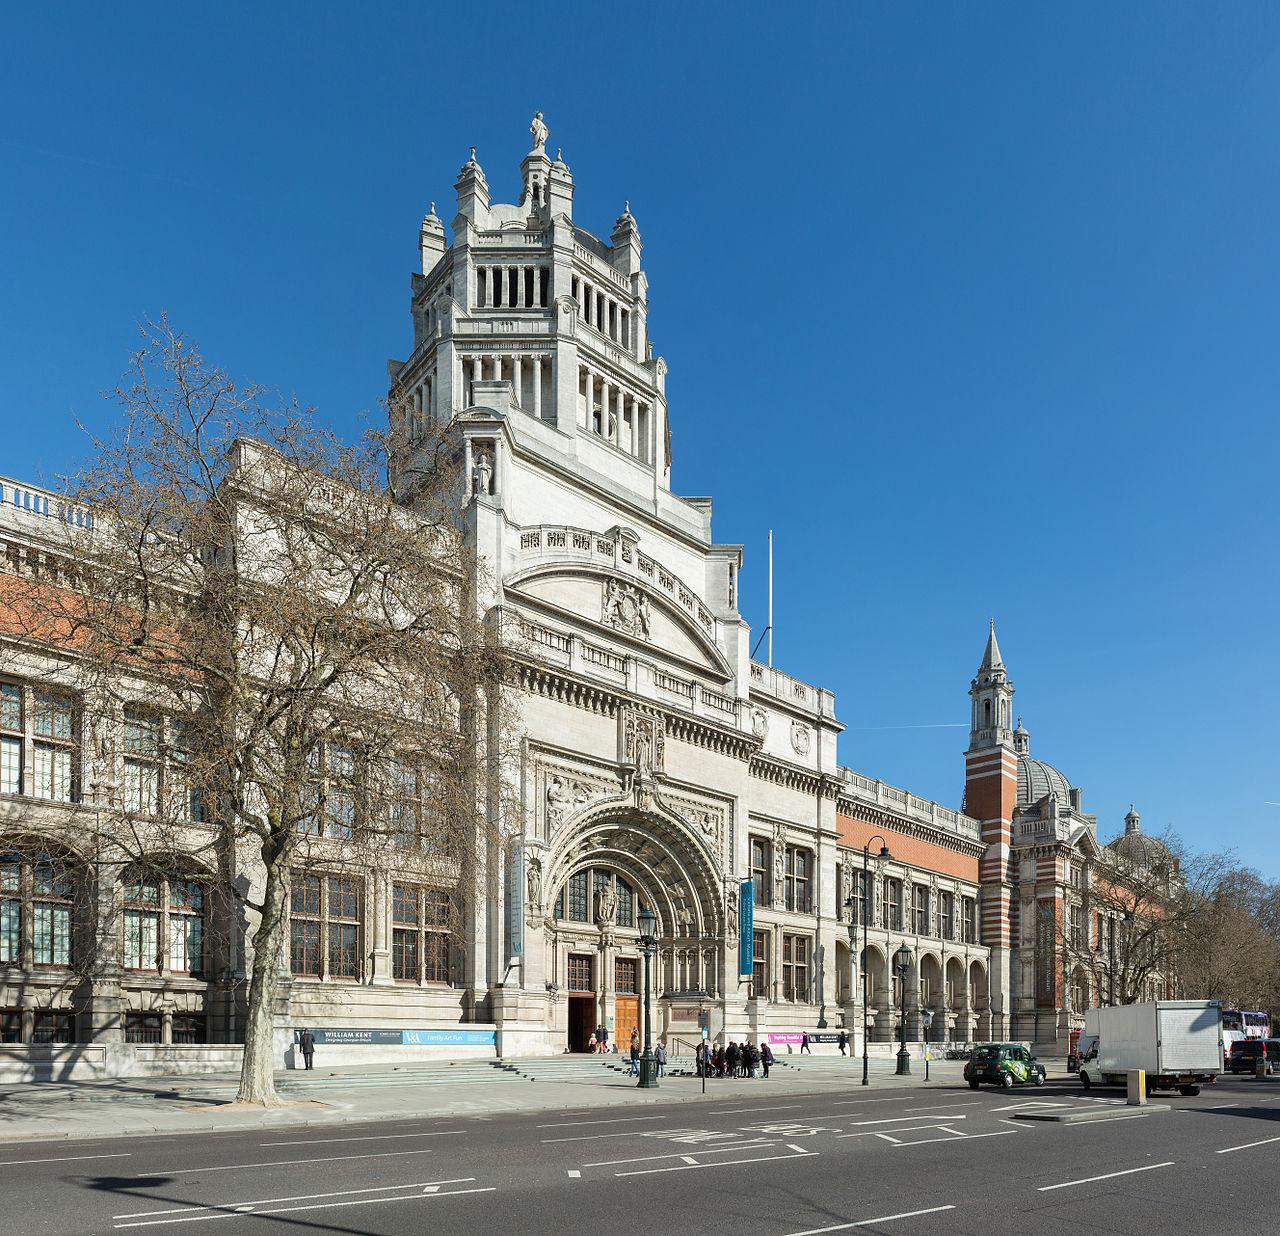 Victoria_&_Albert_Museum_Entrance,_London,_UK_-_Diliff